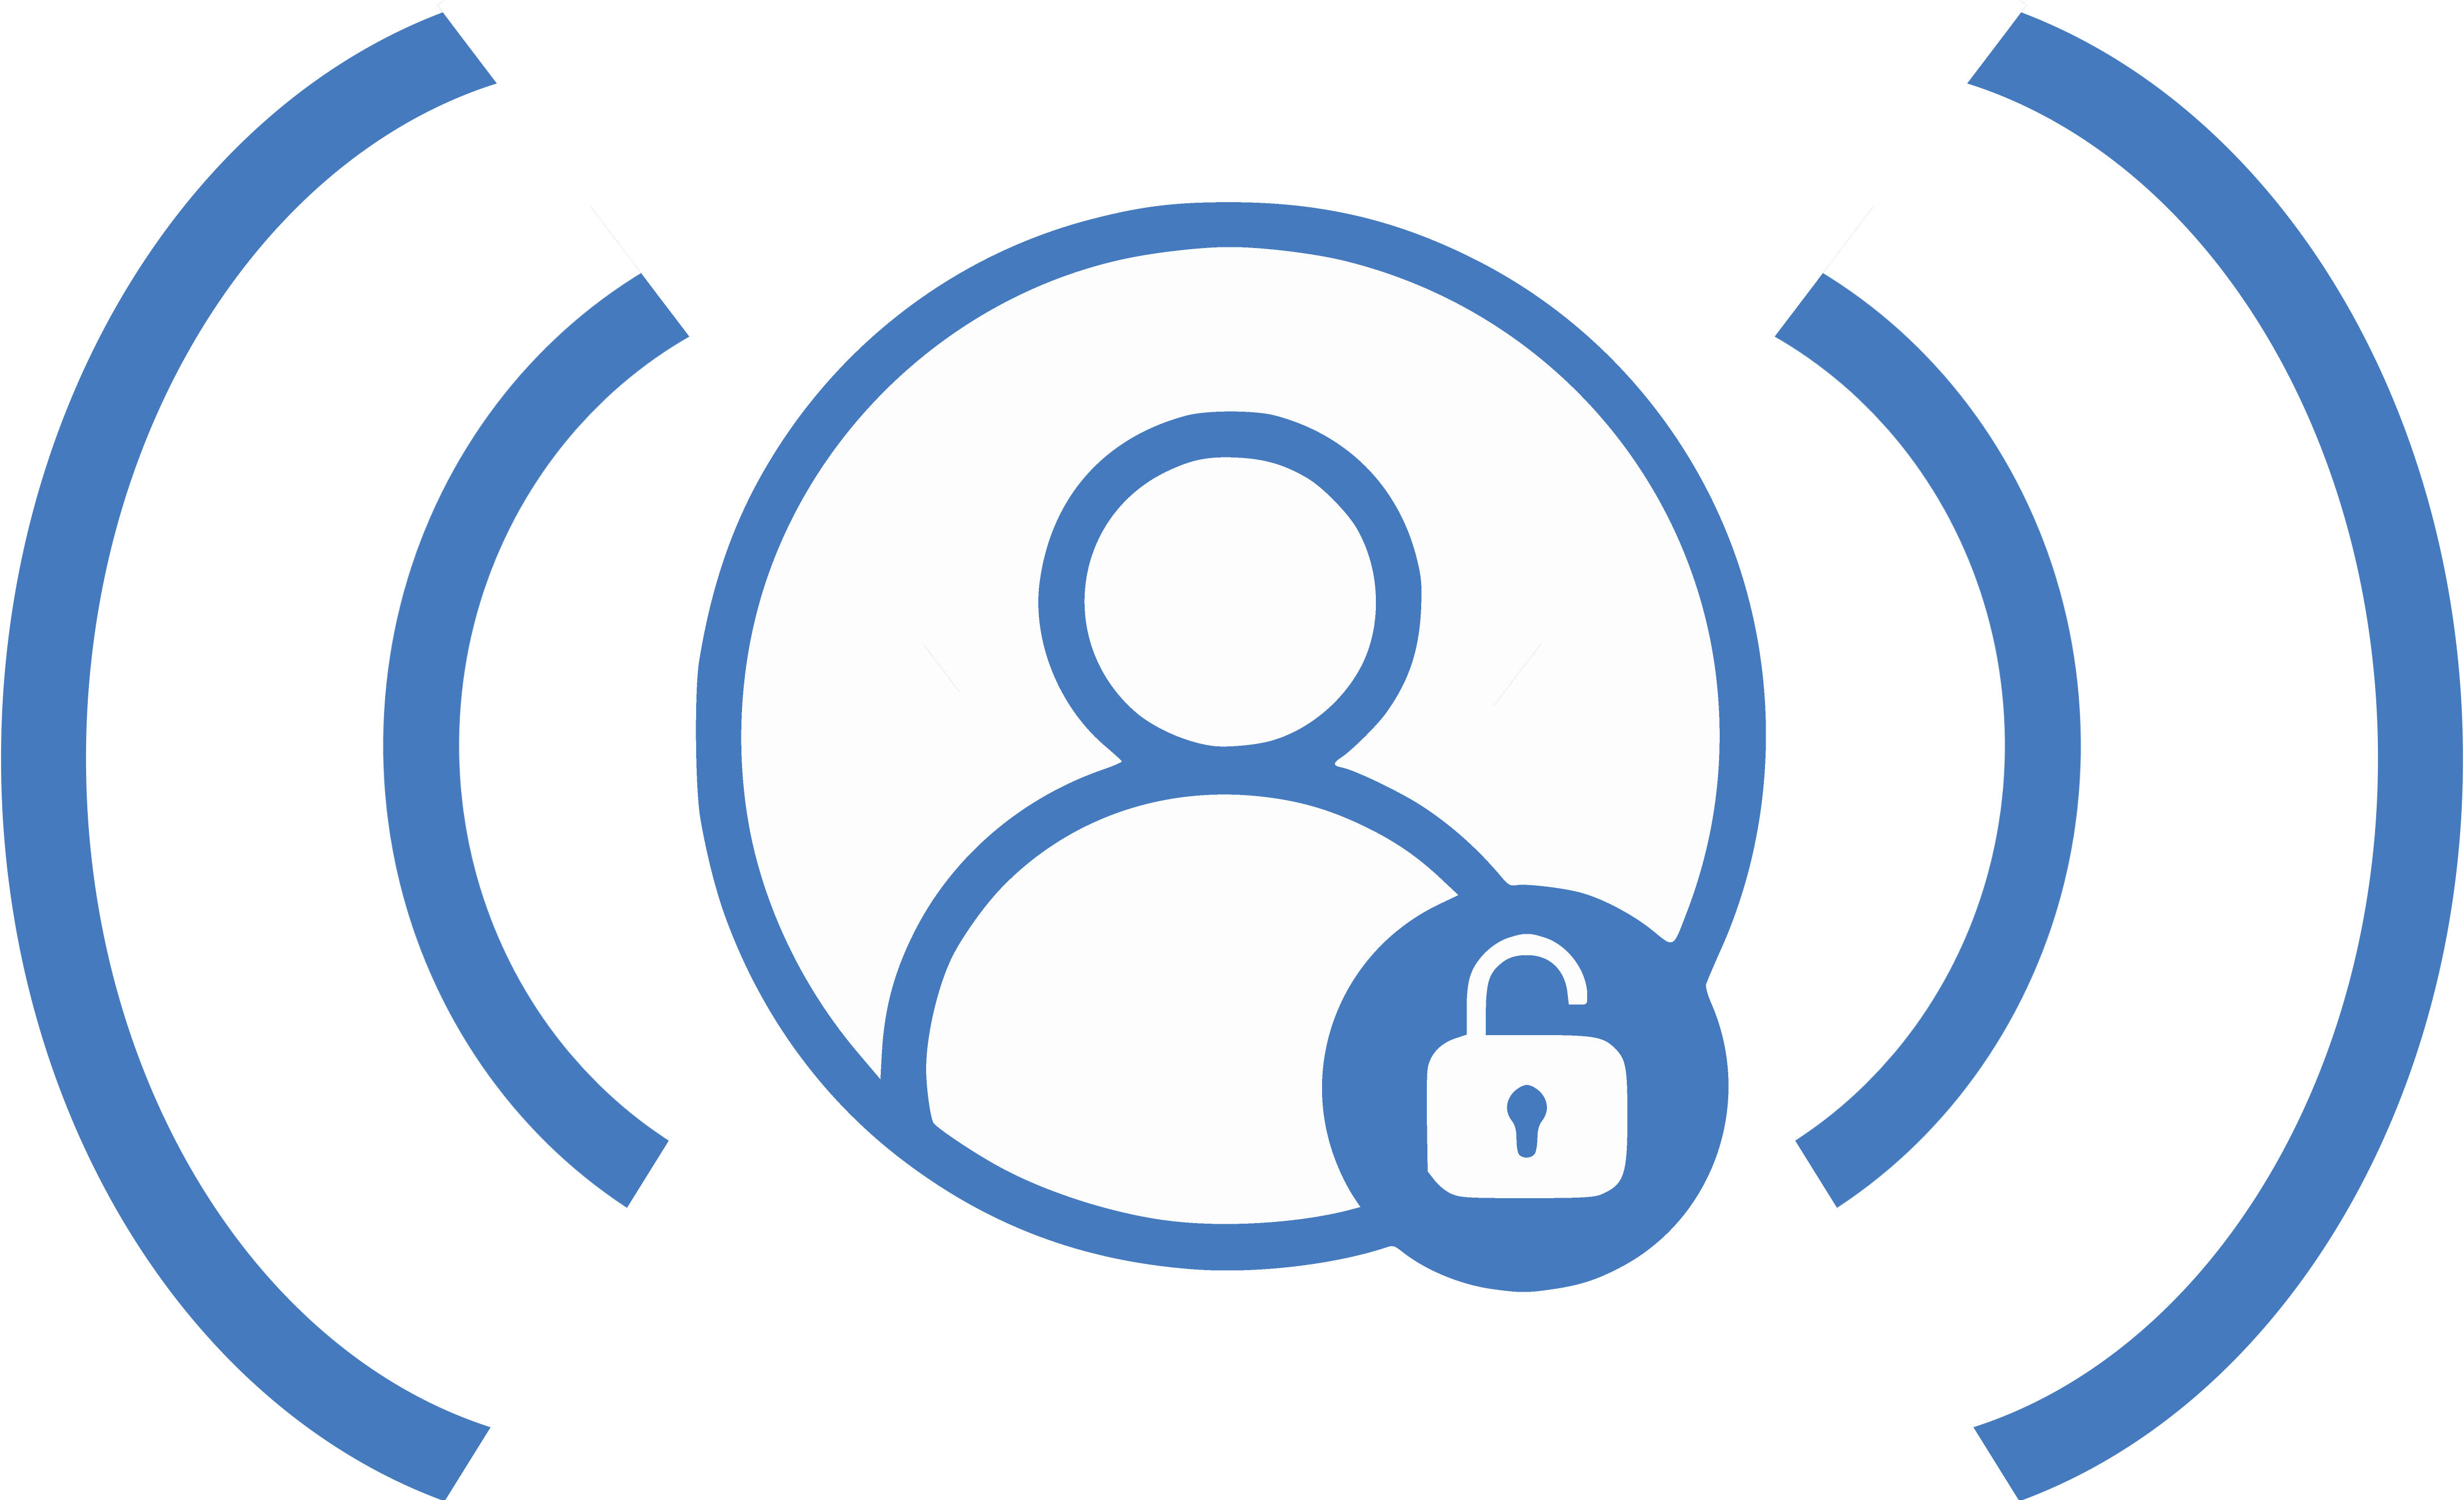 Proximity_Login_GateKeeper_Proximity_Passwordless_2FA_MFA_Autolock_Windows_login_security_compliance_hardware_token.png